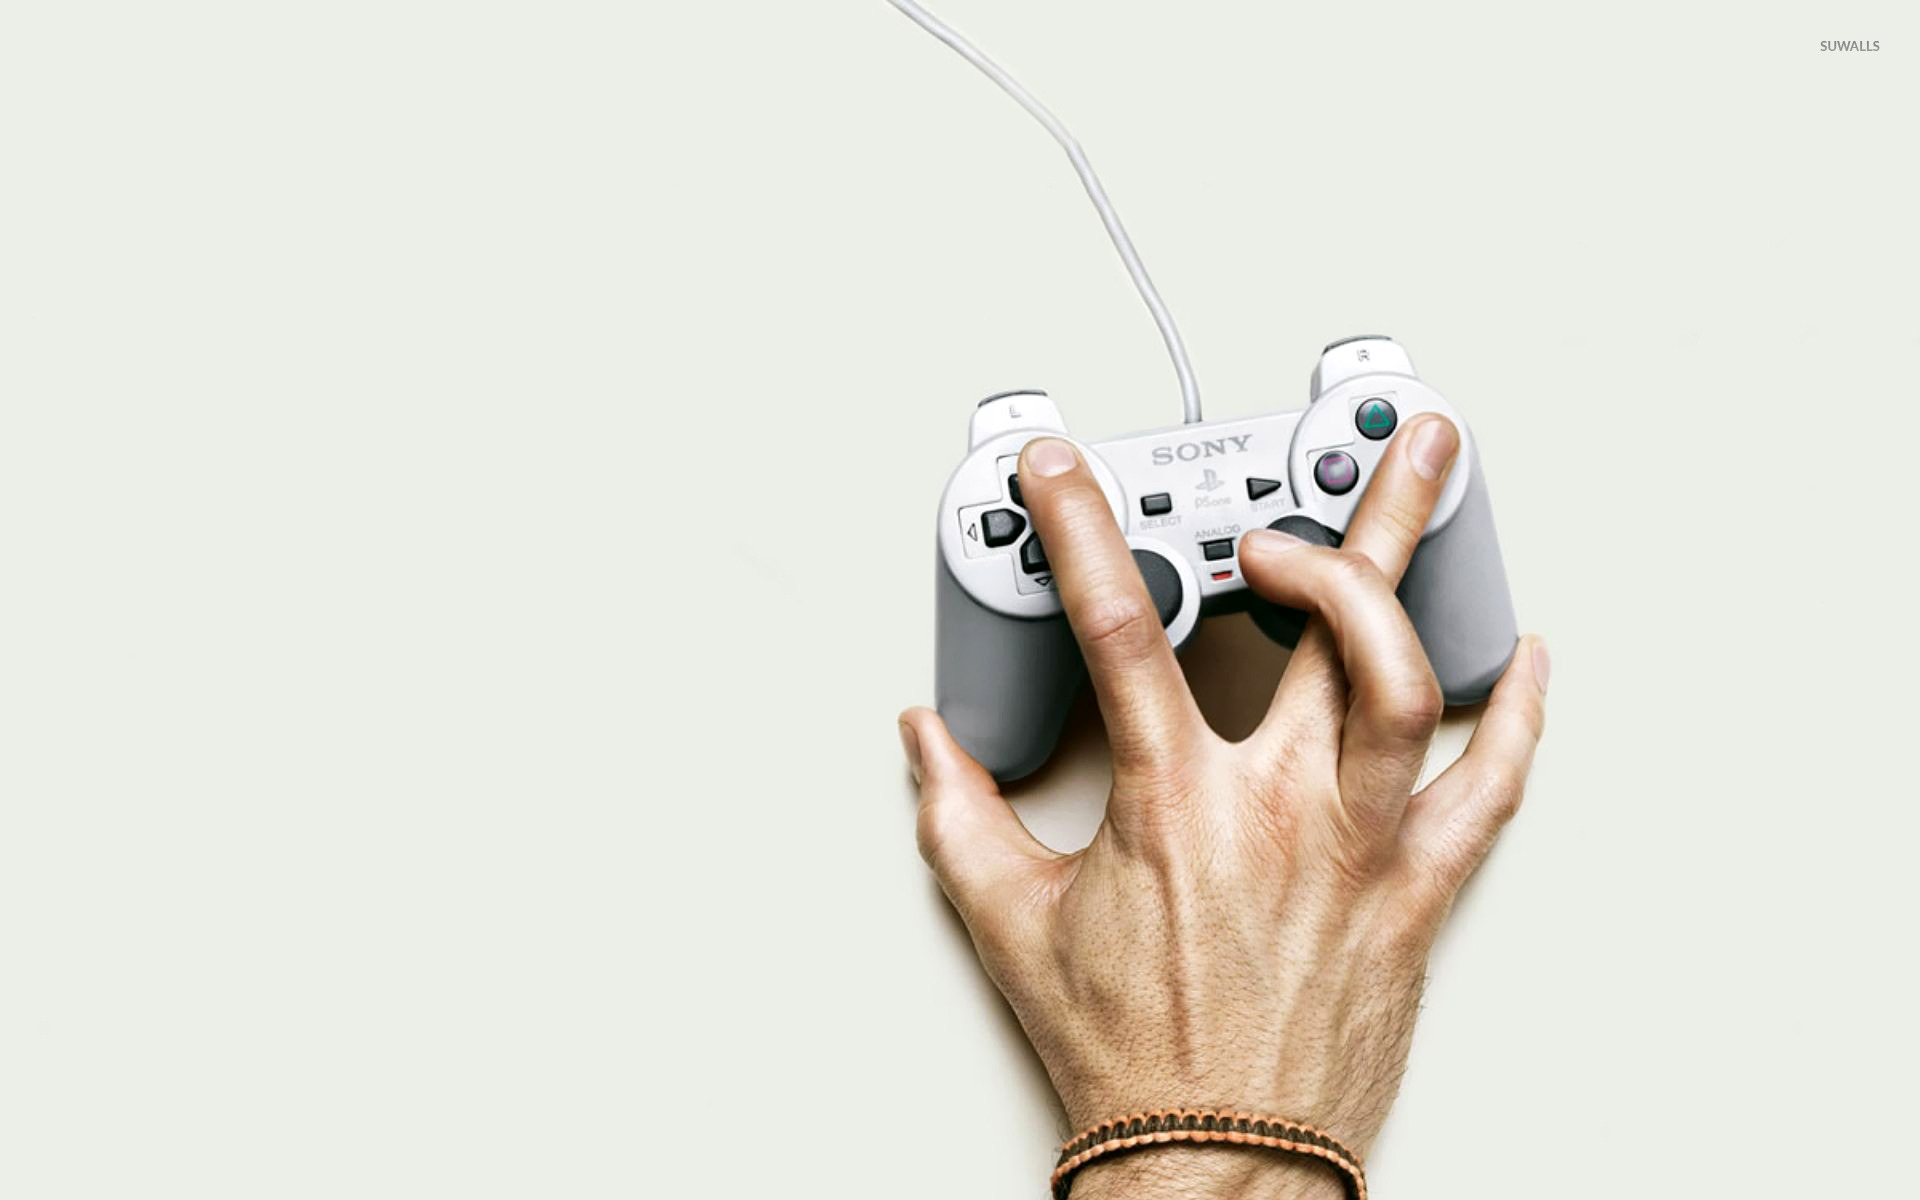 Gamer Thug Controller Hd Wallpapers: PlayStation Controller Wallpaper